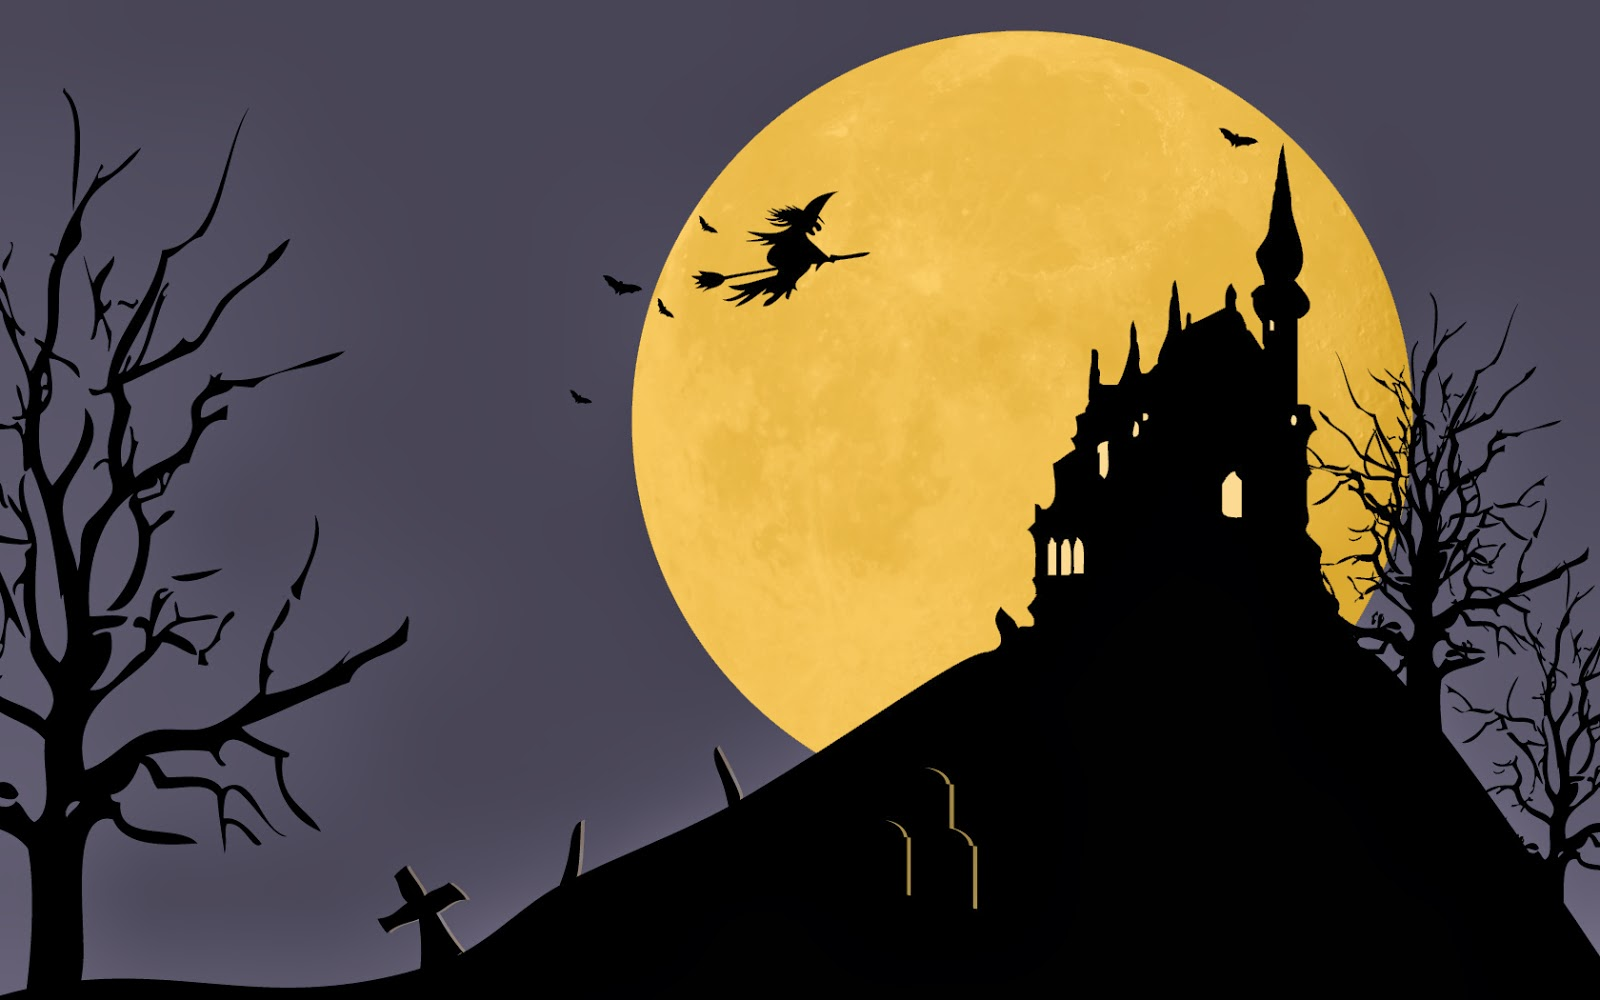 free-halloween-desktop-background-into-painting.jpg